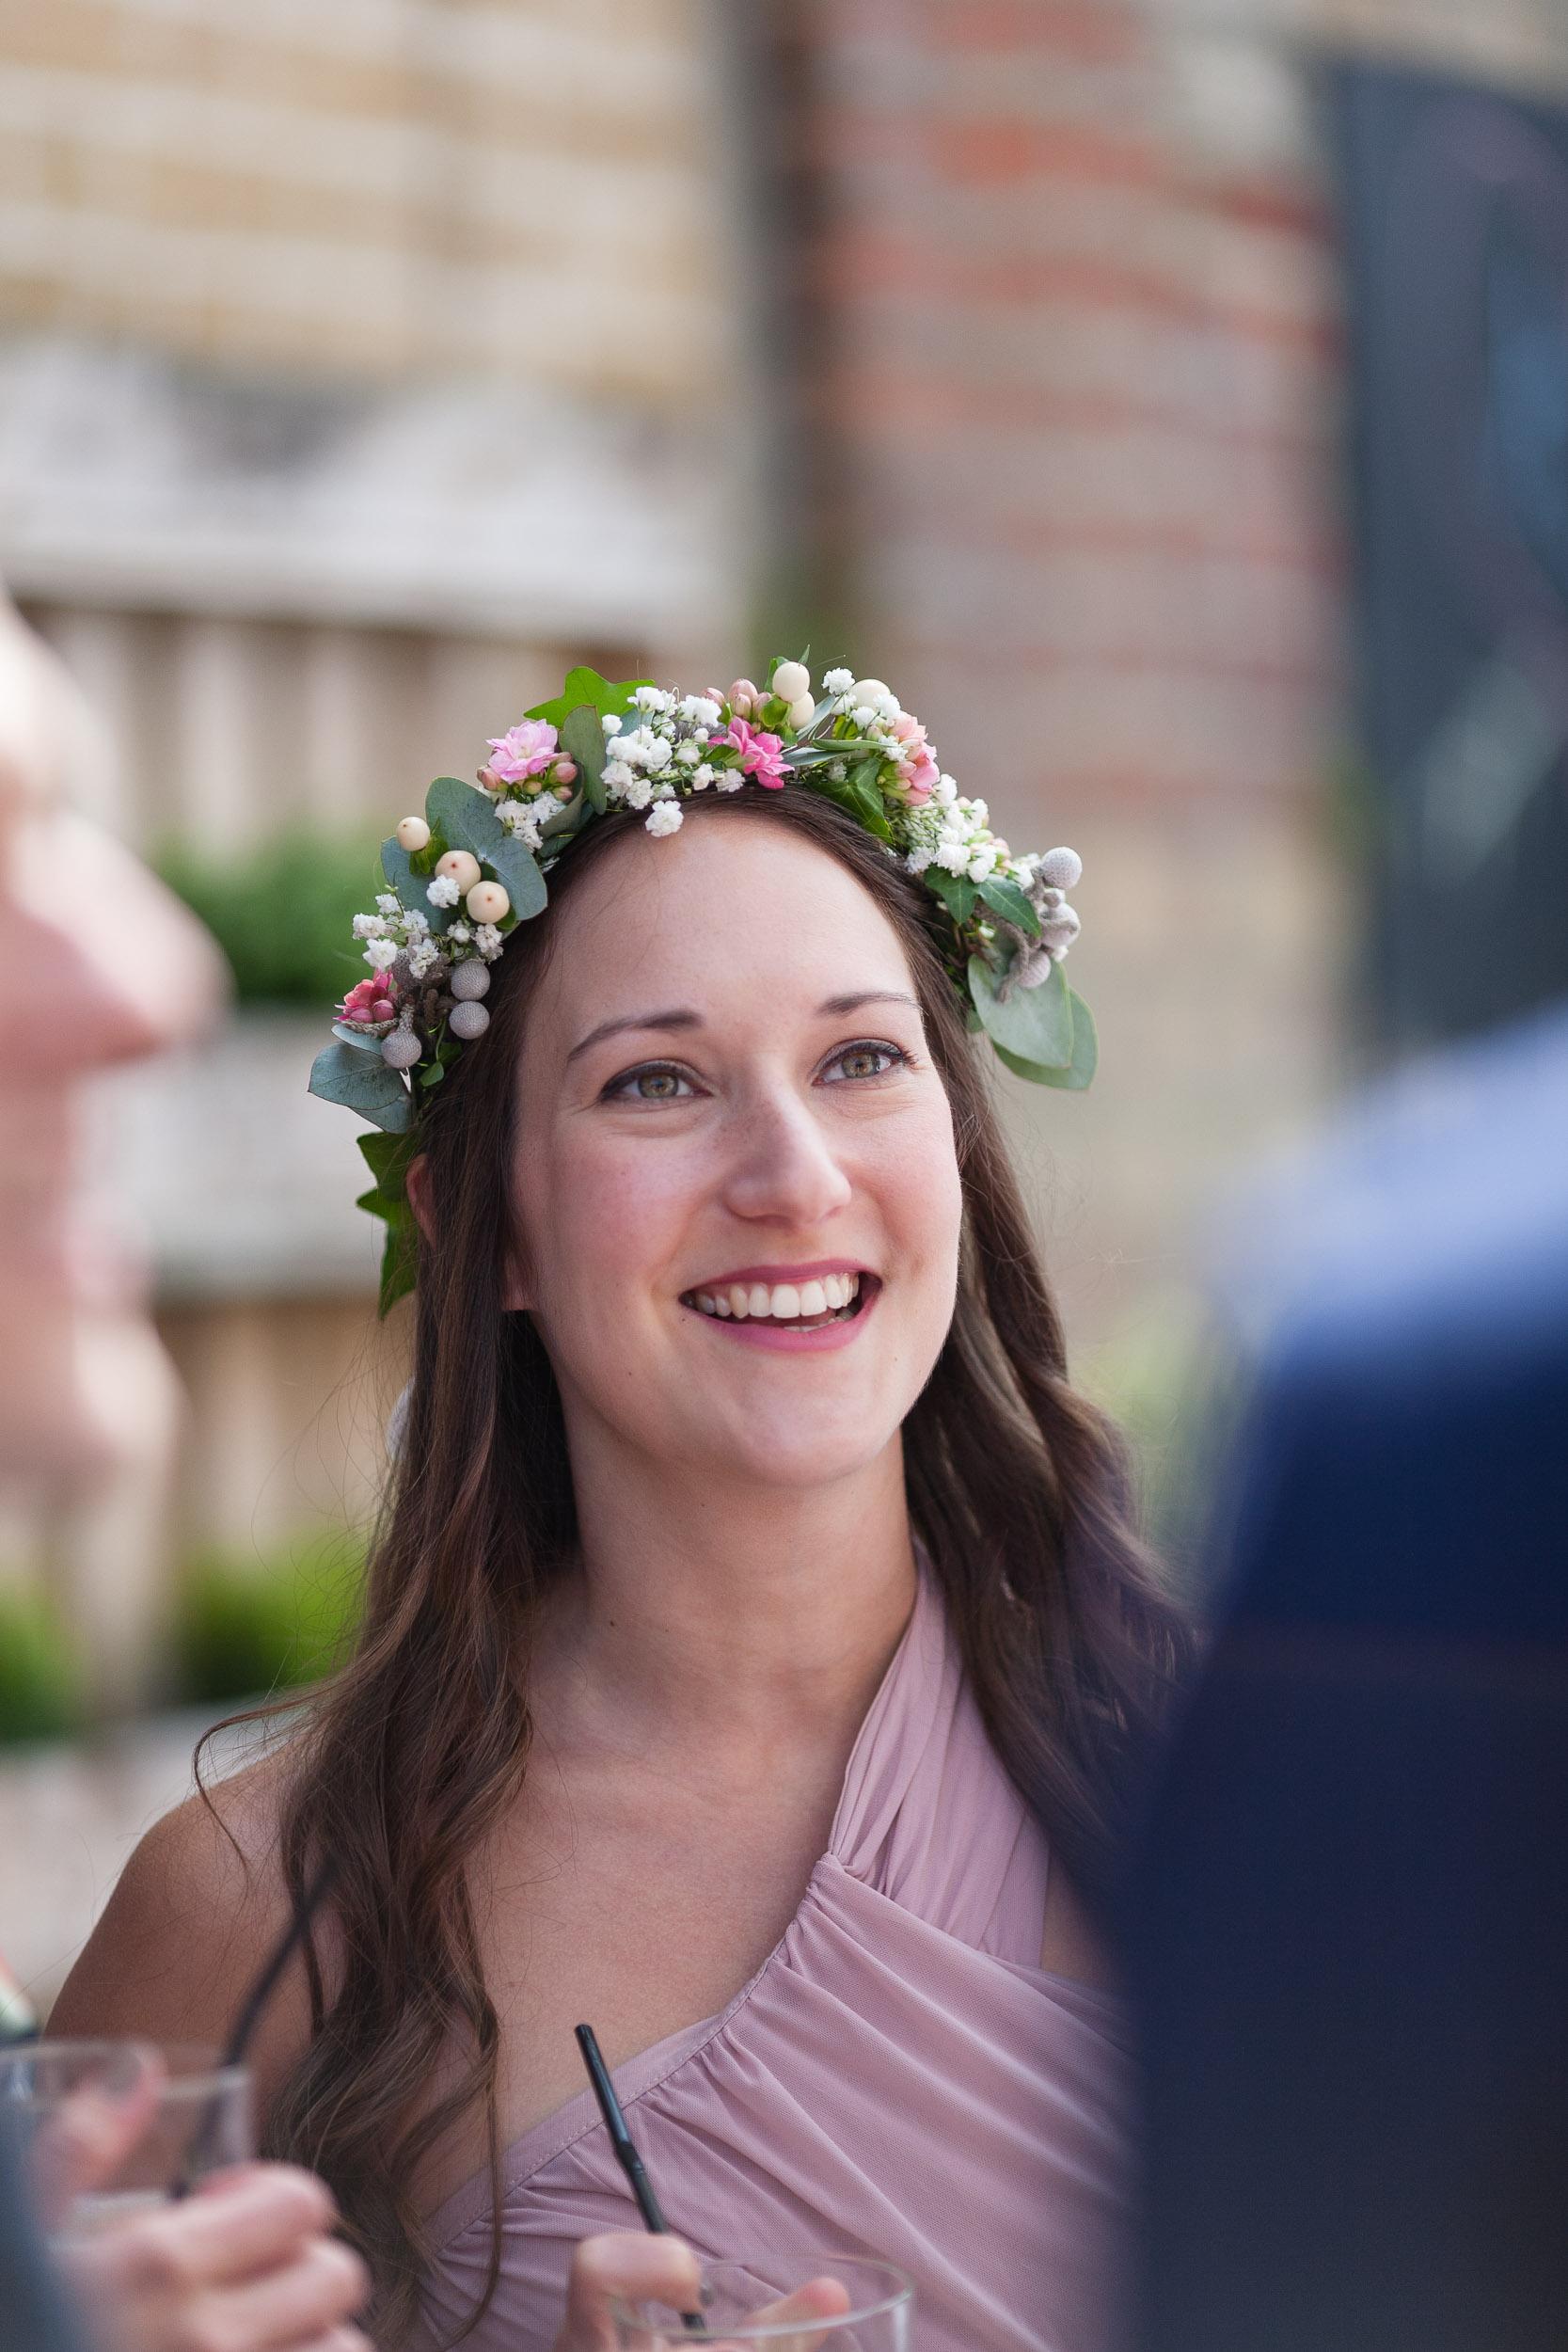 brockwell-lido-brixton-herne-hill-wedding-073.jpg